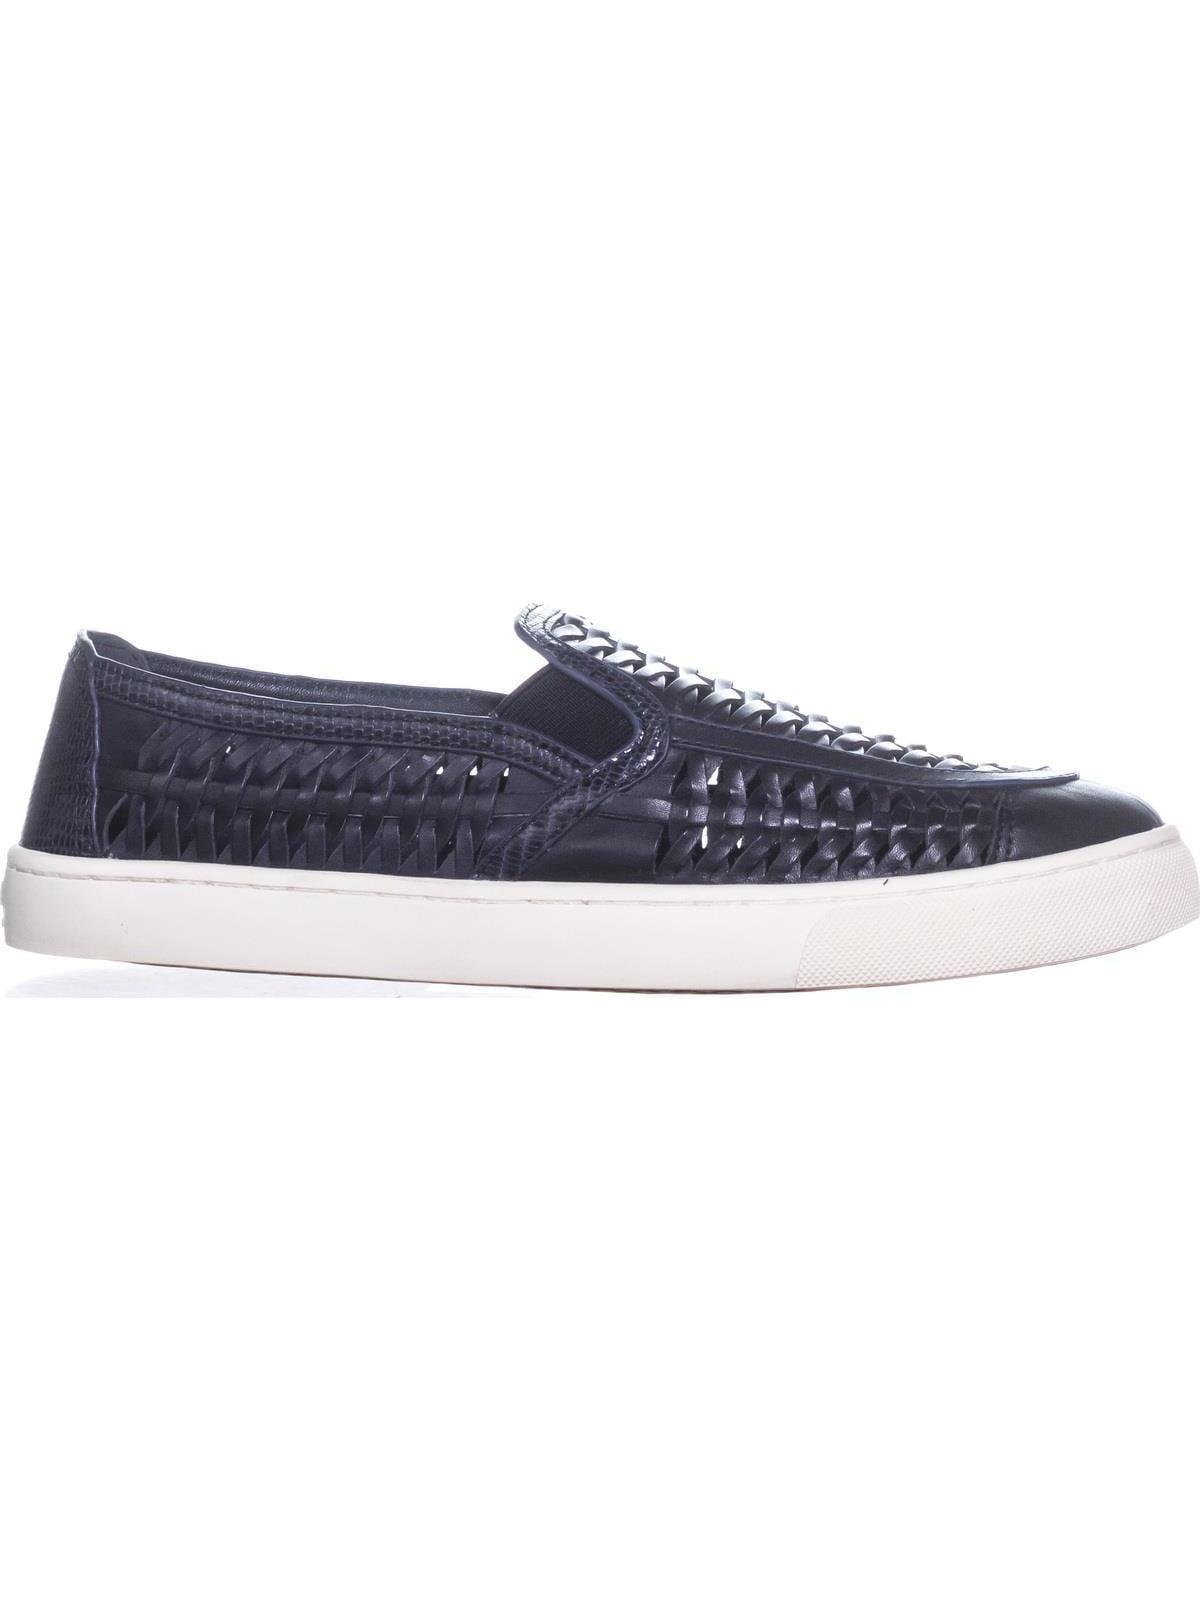 422e9a4c01fd Tory Burch Huarache Slip On Woven Sneakers